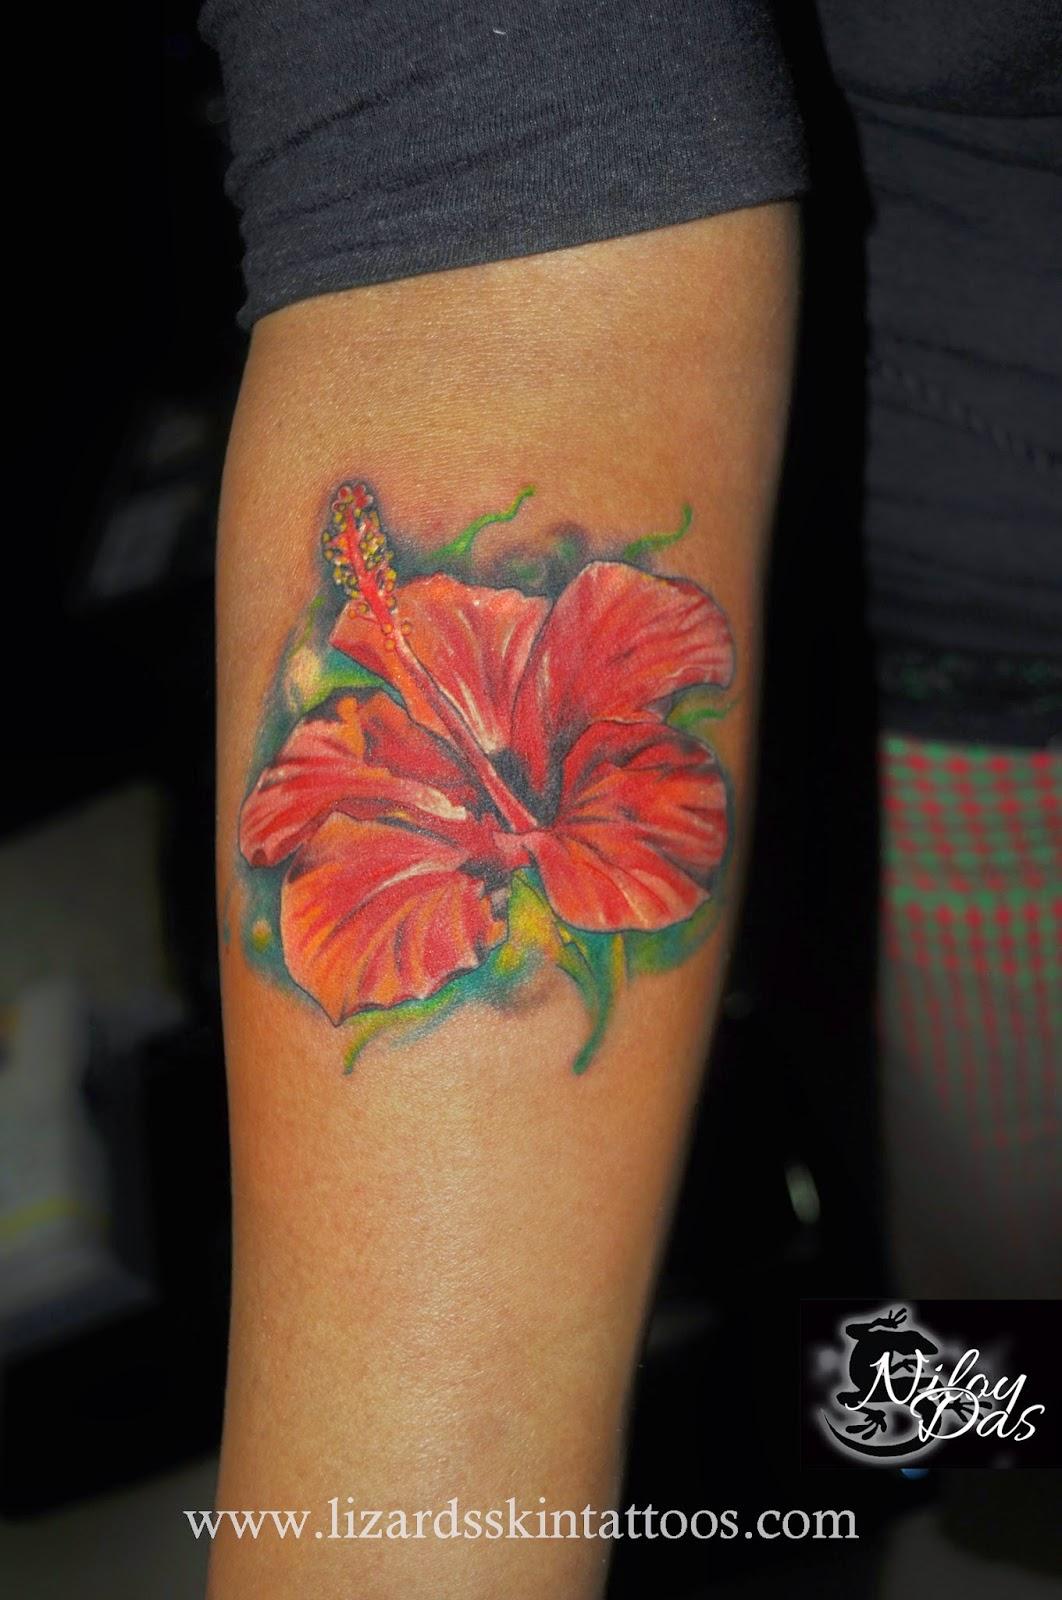 Lizards skin tattoos hibiscus flower tattoo by artist niloy das india hibiscus flower tattoo by artist niloy das india izmirmasajfo